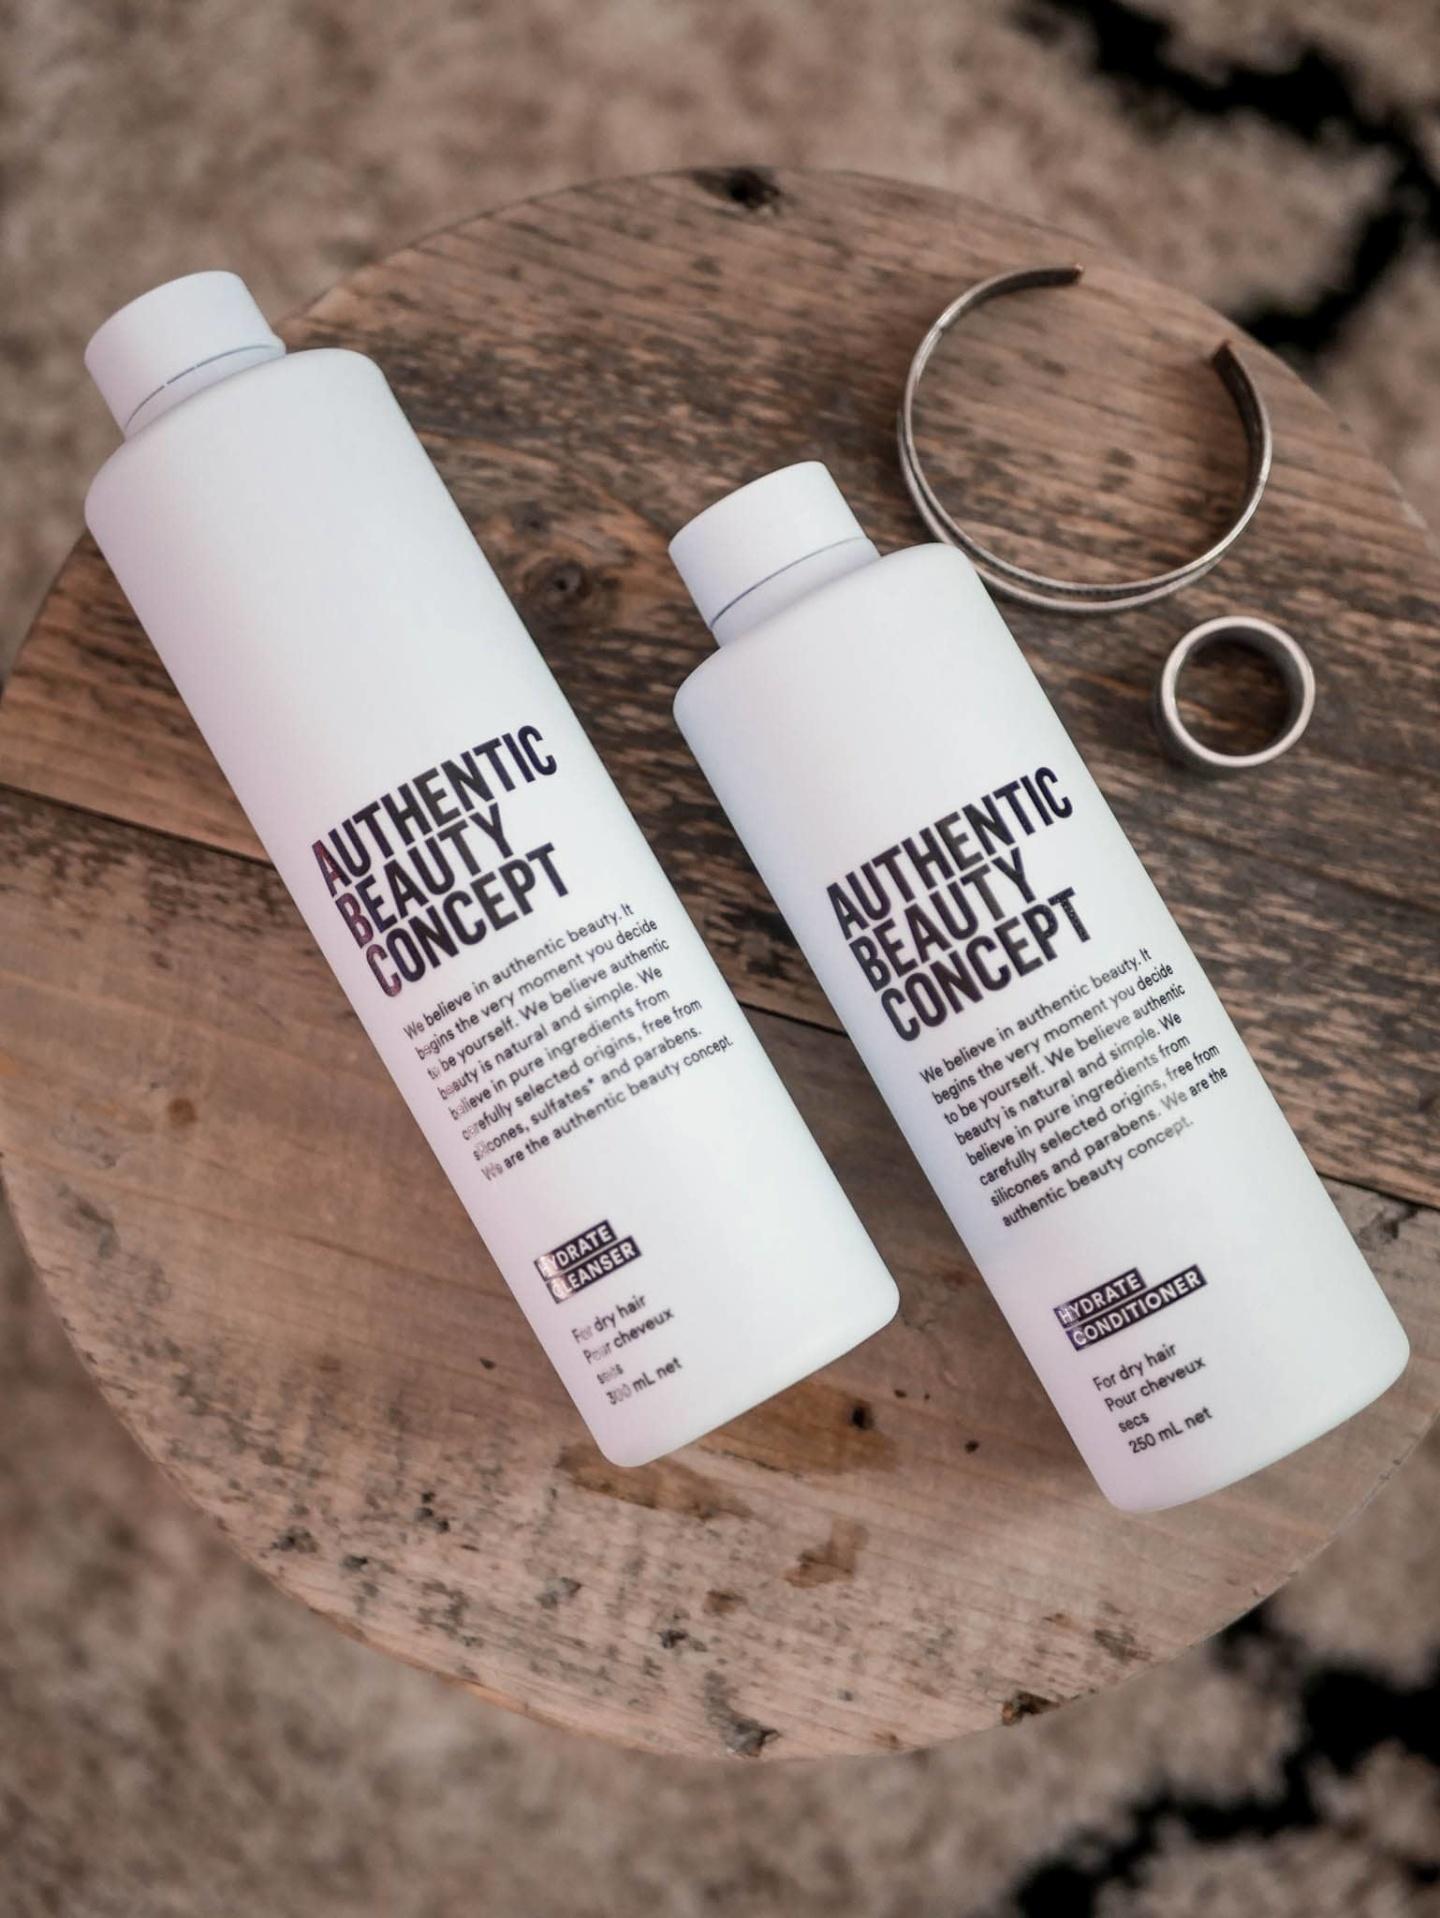 Authentic beauty concept bain hydratant avis